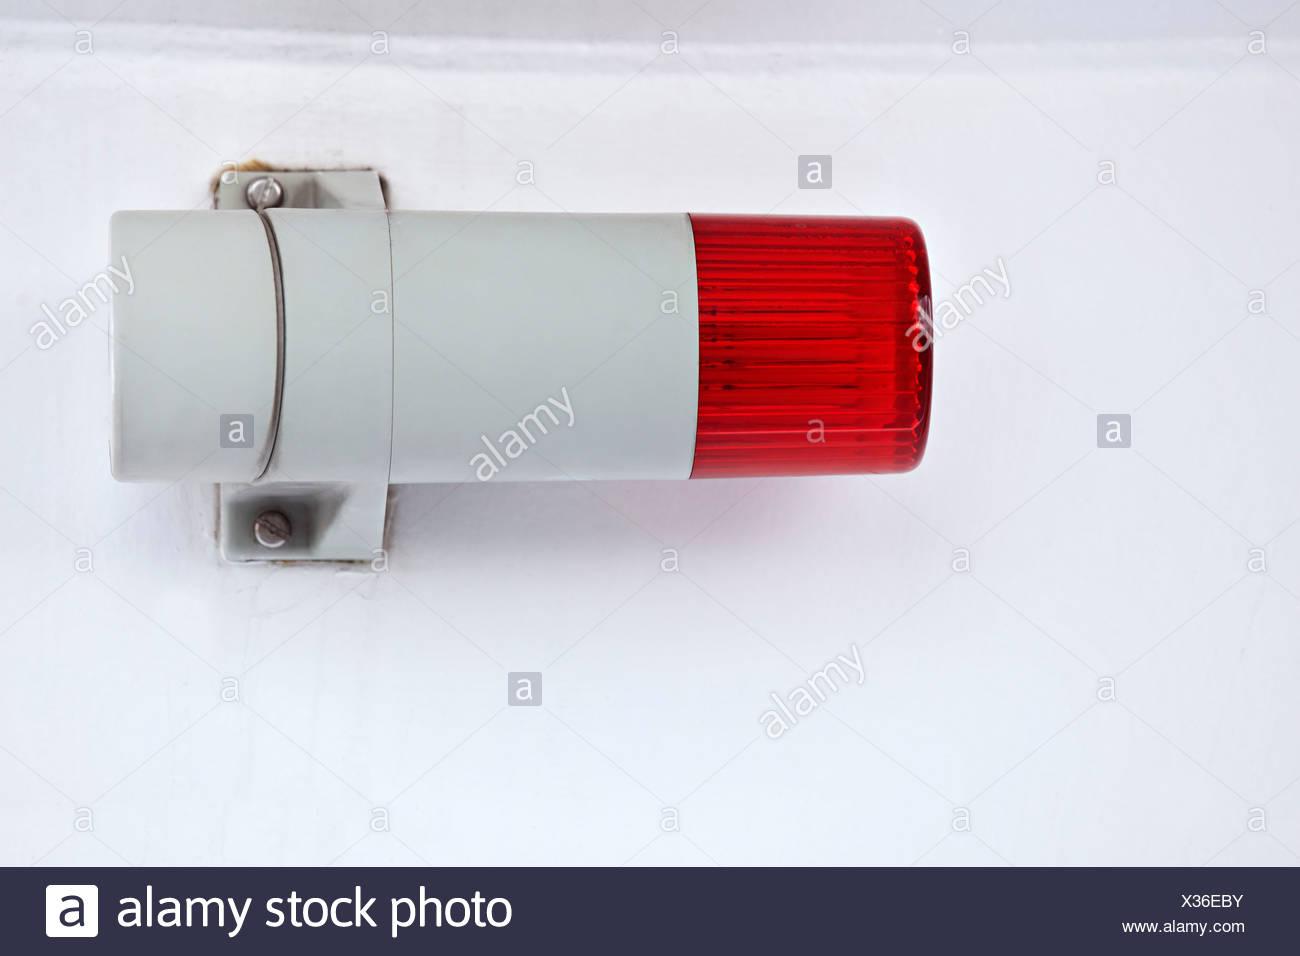 Navigation light, marker light, sidelight, shipping signal, red light on portside - Stock Image